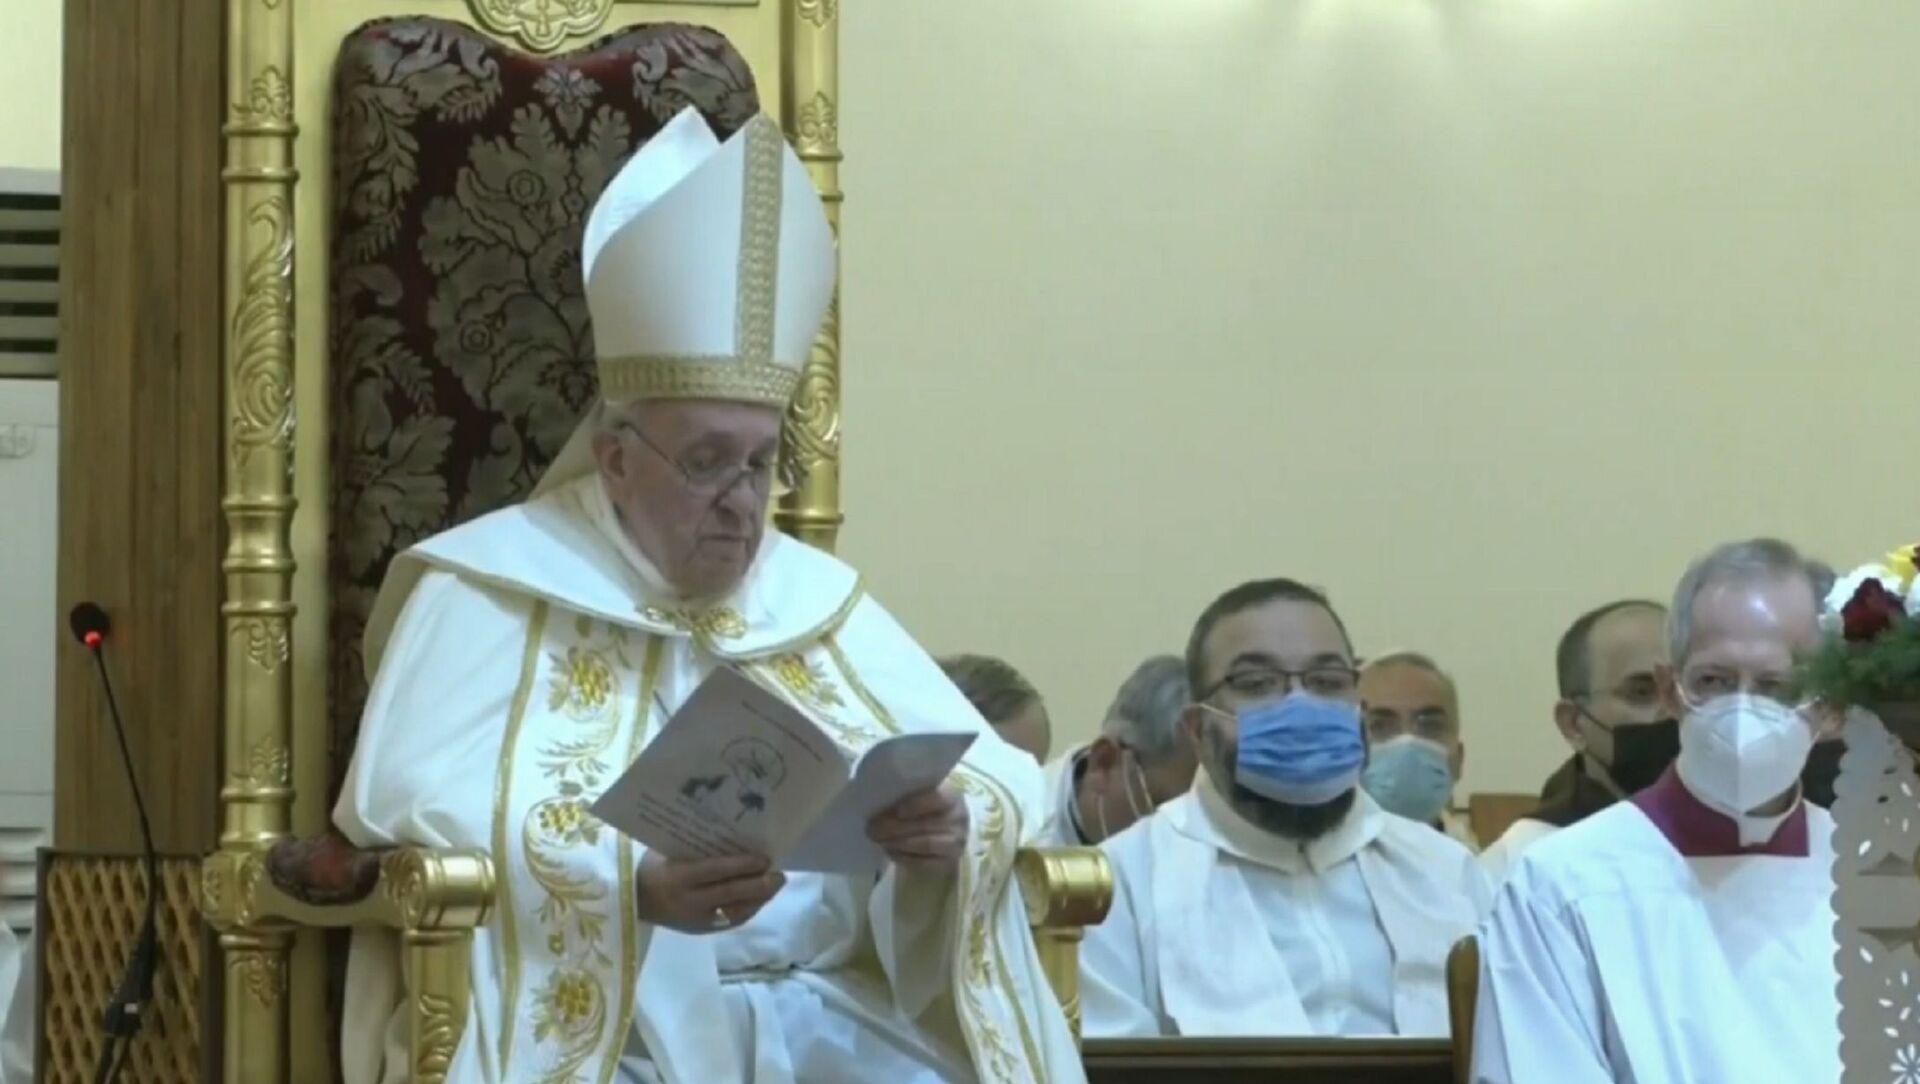 Papa Francesco celebra la messa a Baghdad - Sputnik Italia, 1920, 06.03.2021